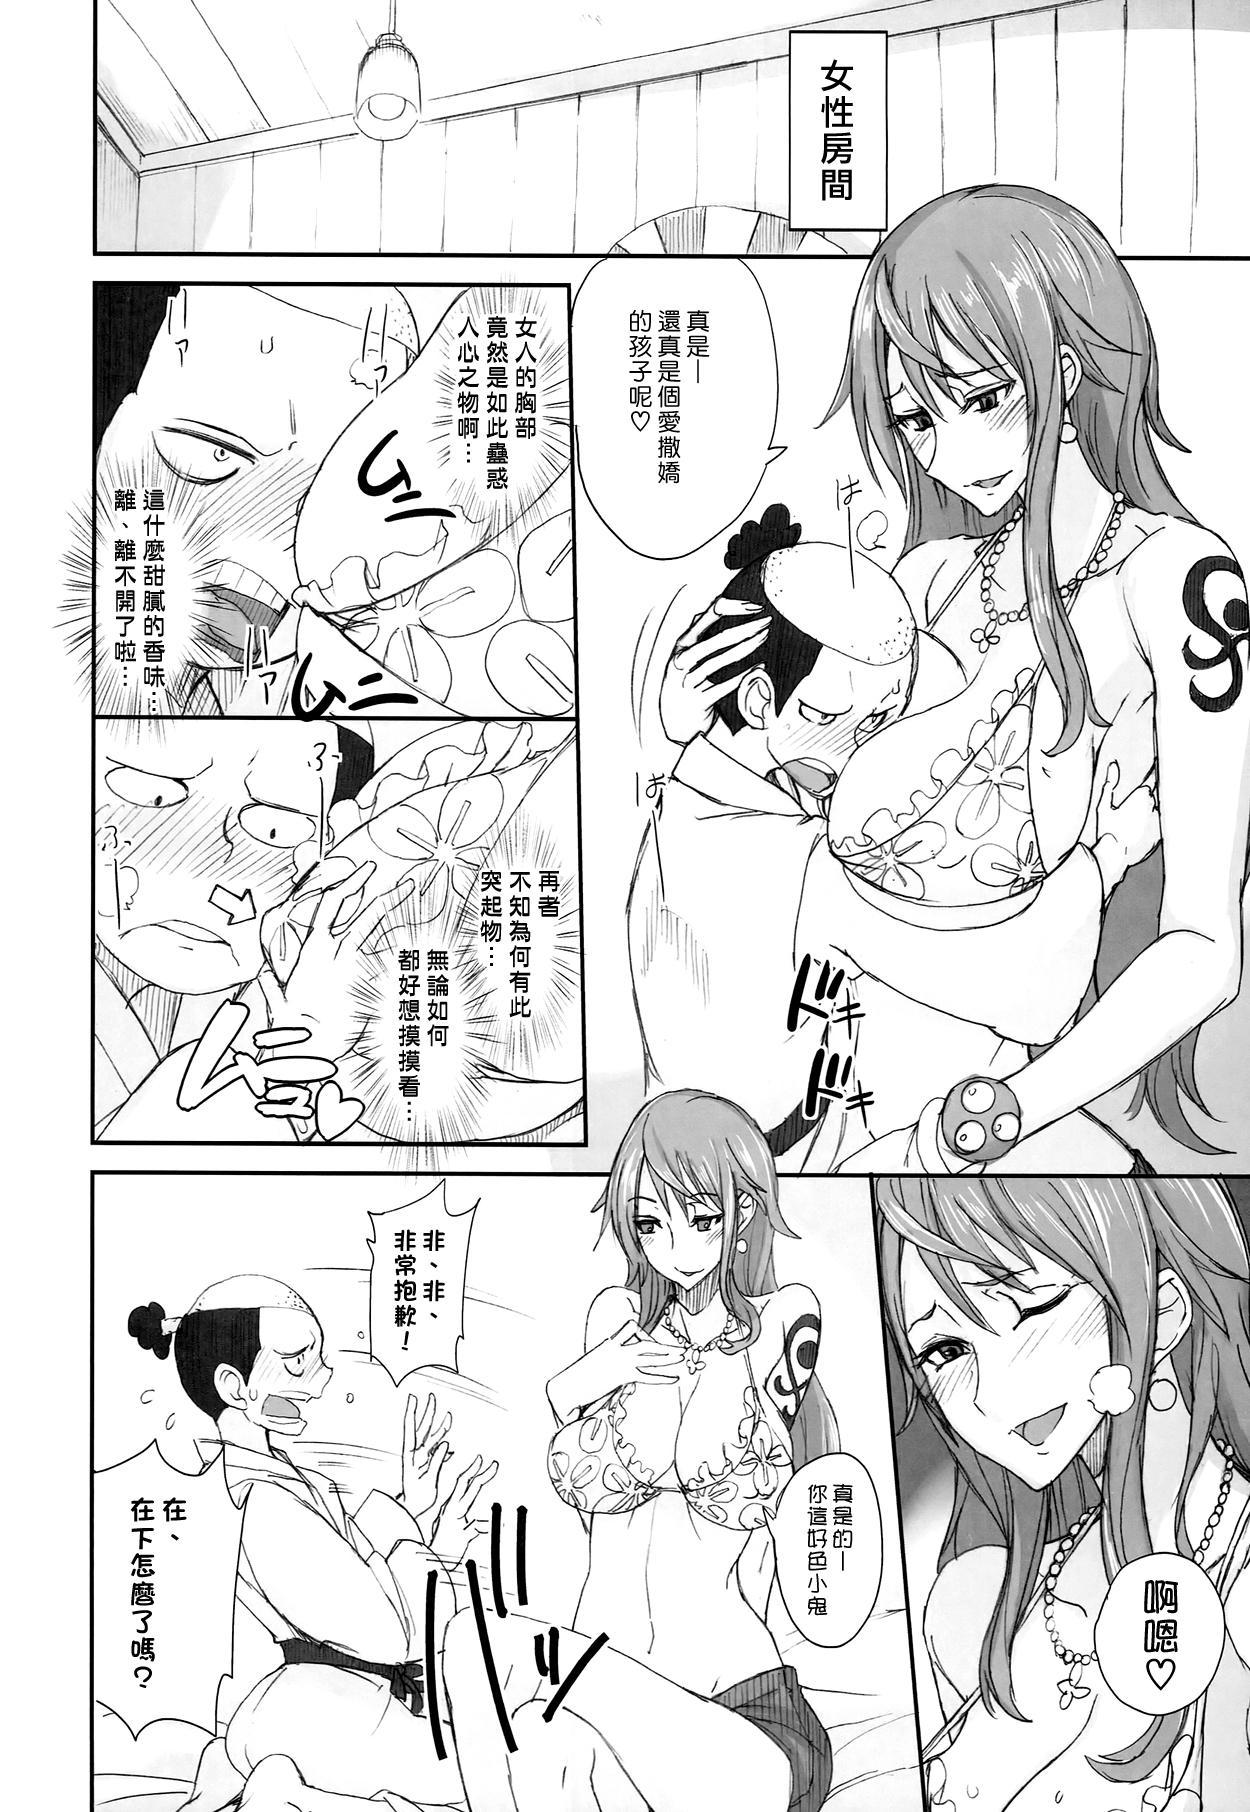 Grandline Chronicle 3 Momo ☆ Momo 5